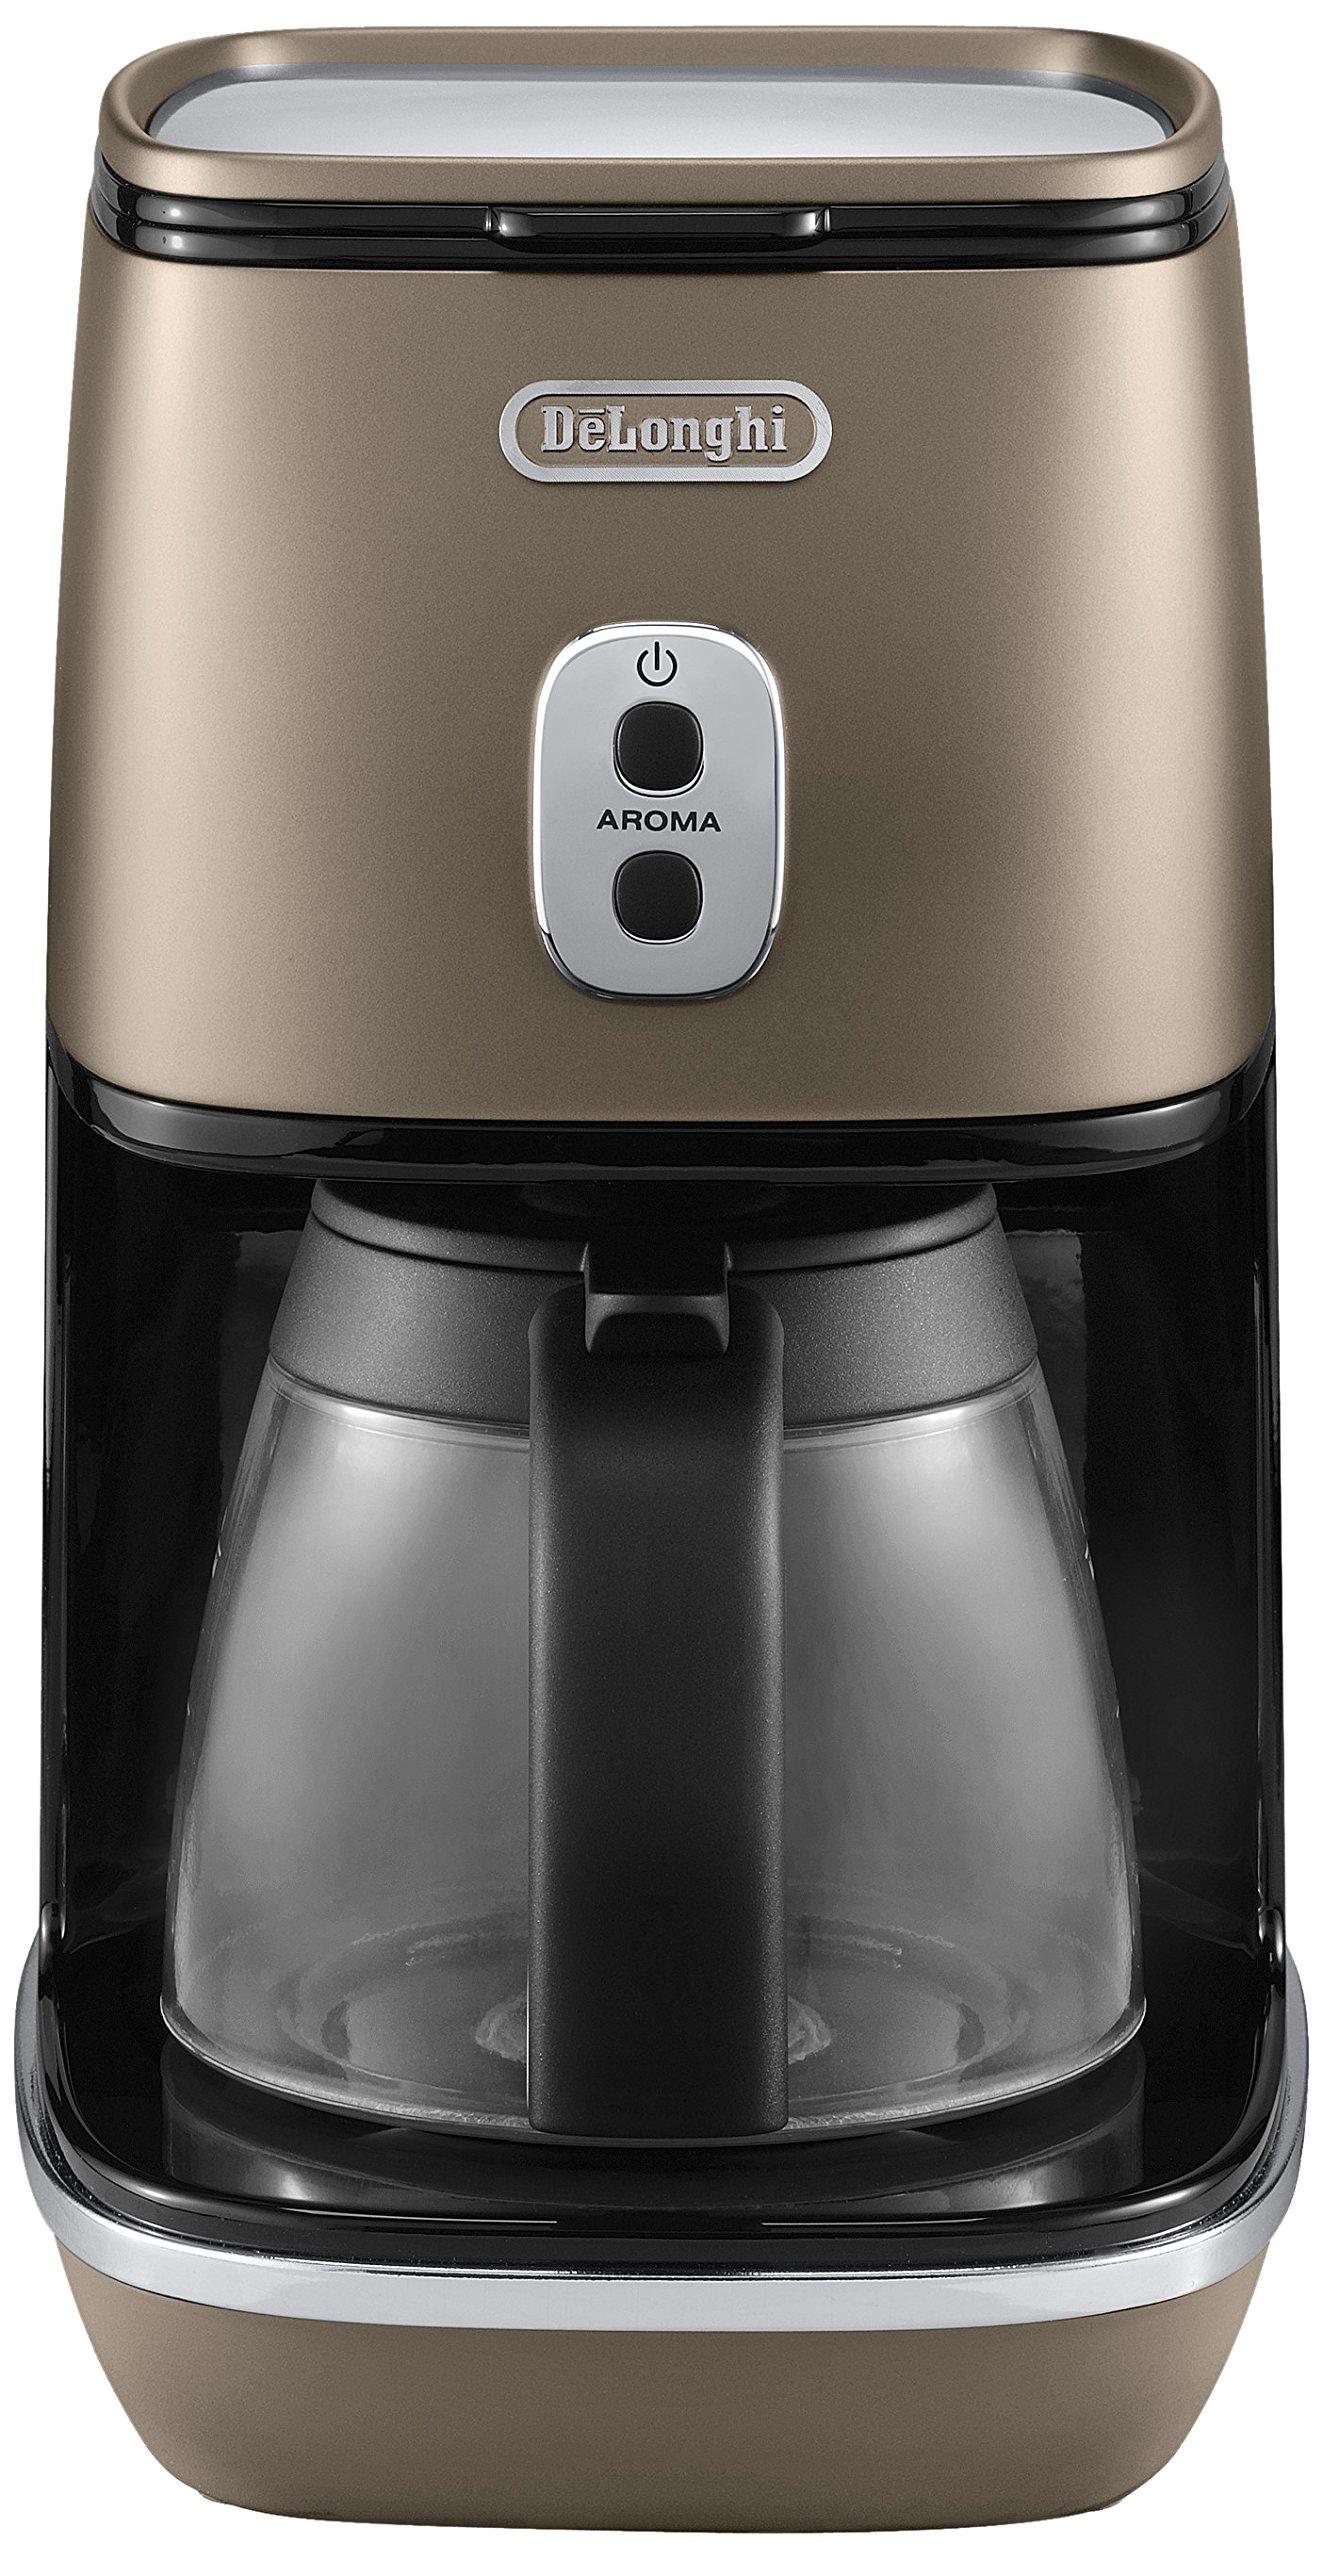 DeLonghi-ICMI-211BK-DISTINTA-Filterkaffeemaschine